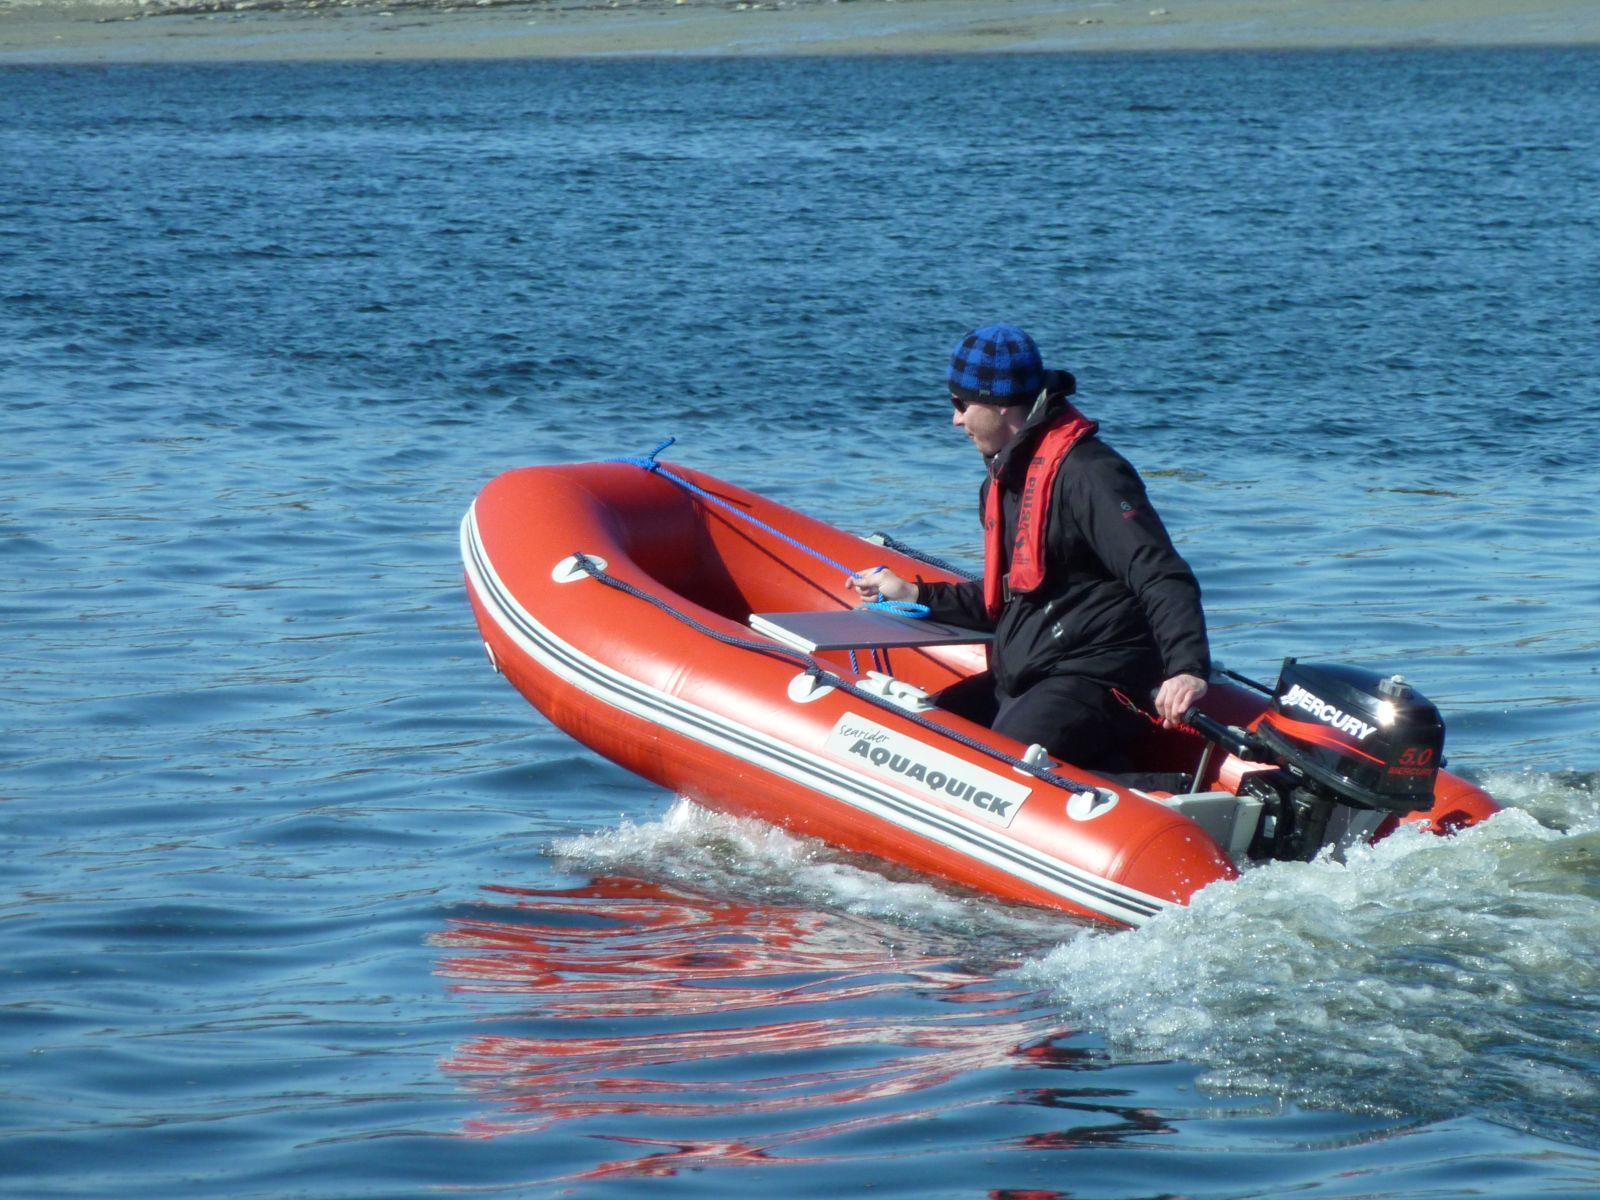 2010-05-13-1535_Jesper tager 1. tur med gummibåden alene_Gummibåd; Jesper Eugenius Labansen; Jesper Labansen; Maritha Eugenius Labansen; Nuuk; Panorama; Saa_2